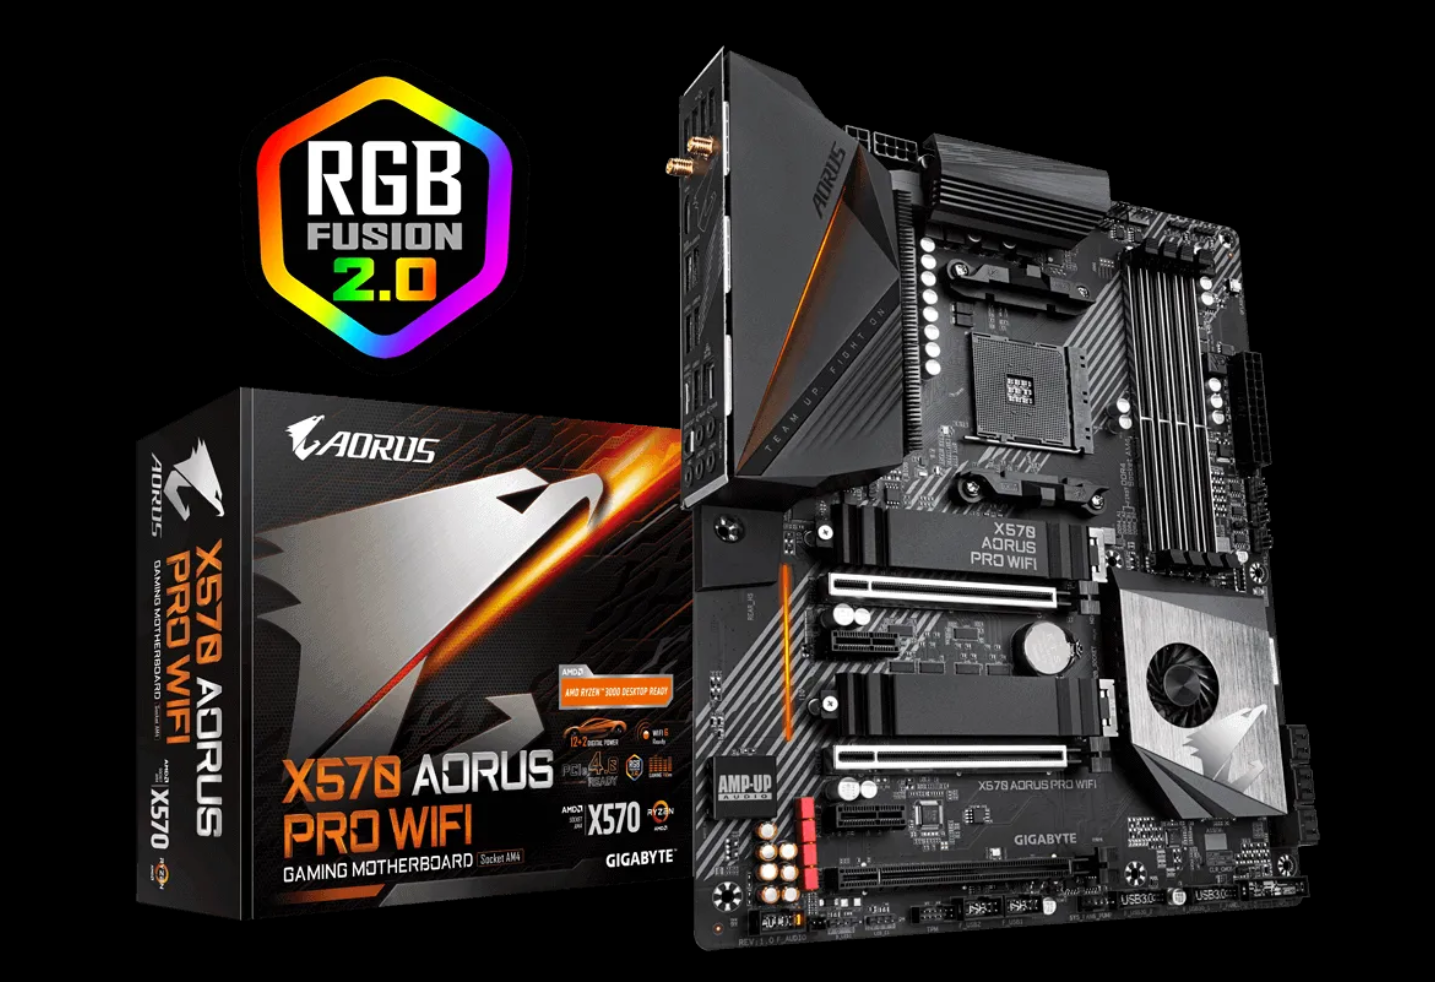 Gigabyte X570S motherboard terlihat dengan AMD Ryzen 7 5700G APU